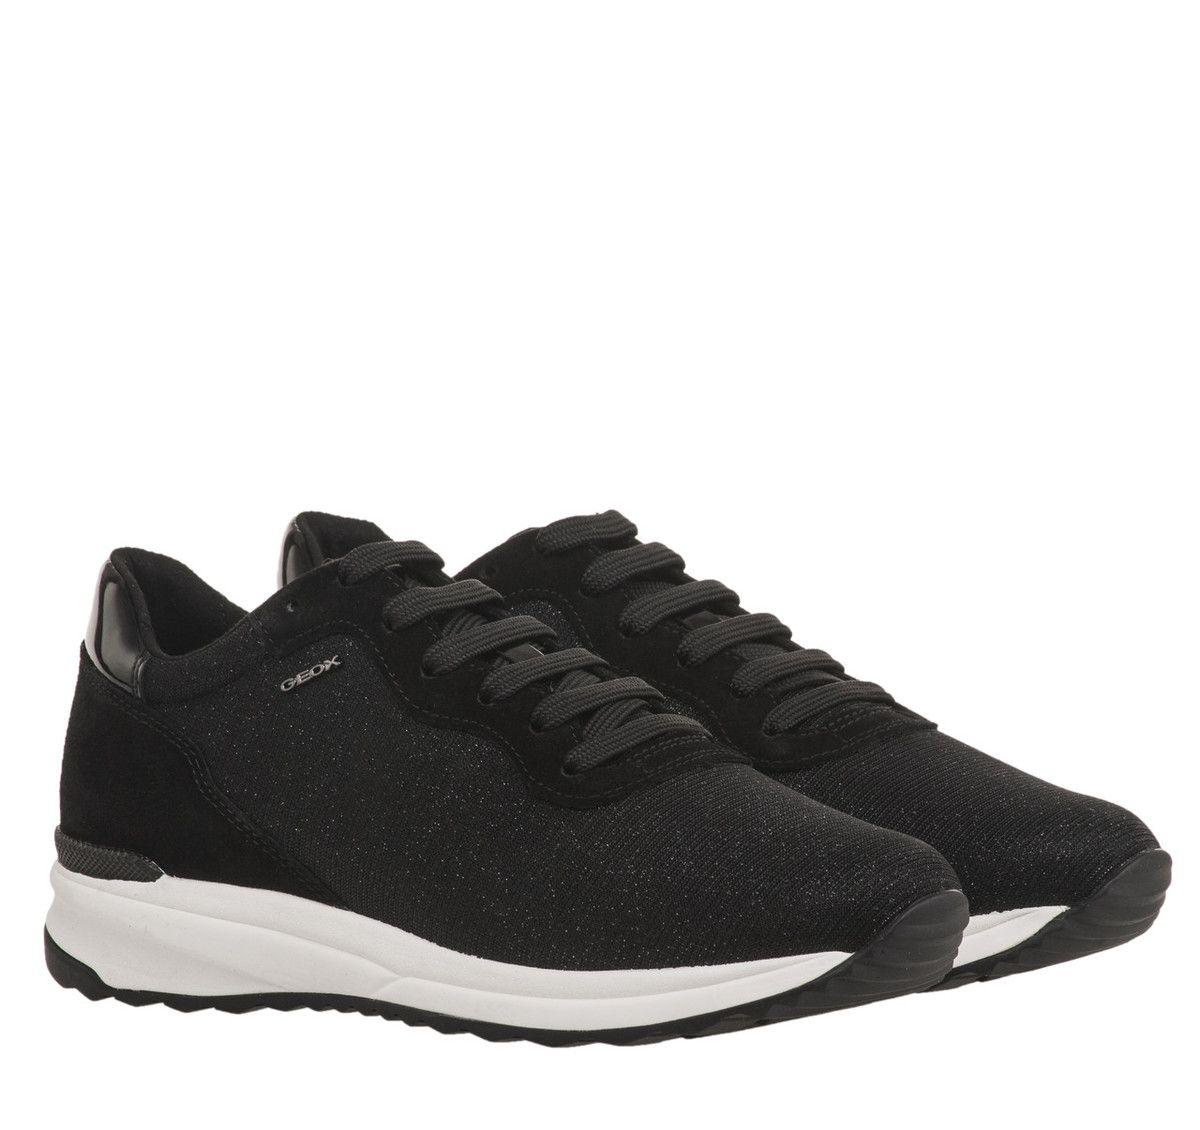 cad96c98817 ΓΥΝΑΙΚΕΙΑ ΠΑΠΟΥΤΣΙΑ SNEAKERS GEOX (BLACK) | My style | Sneakers ...